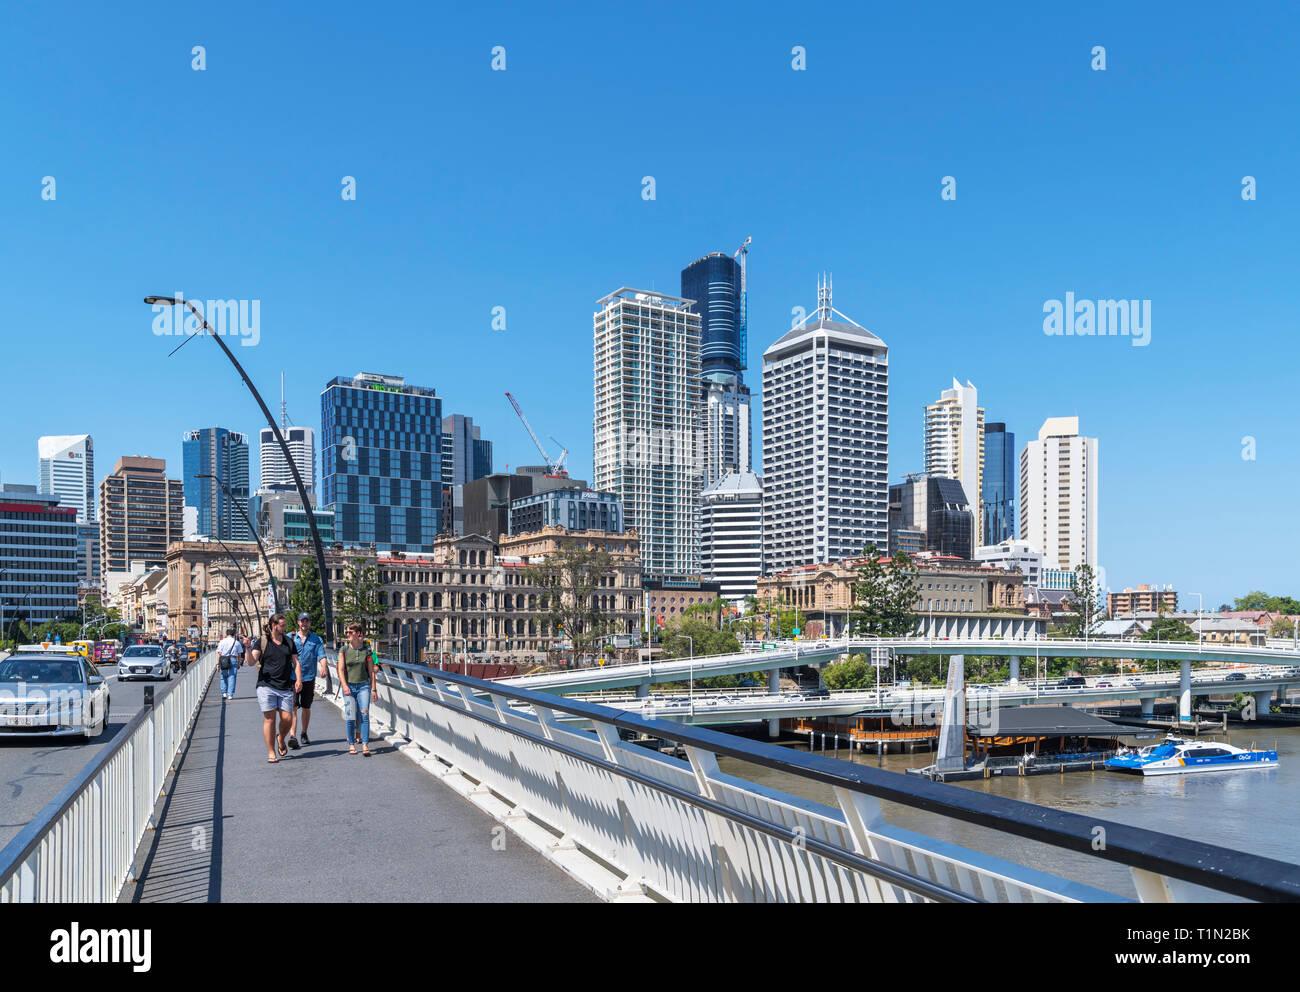 Brisbane, Australia. The skyline of the Central Business District (CBD) from Victoria Bridge, Brisbane, Queensland, Australia - Stock Image